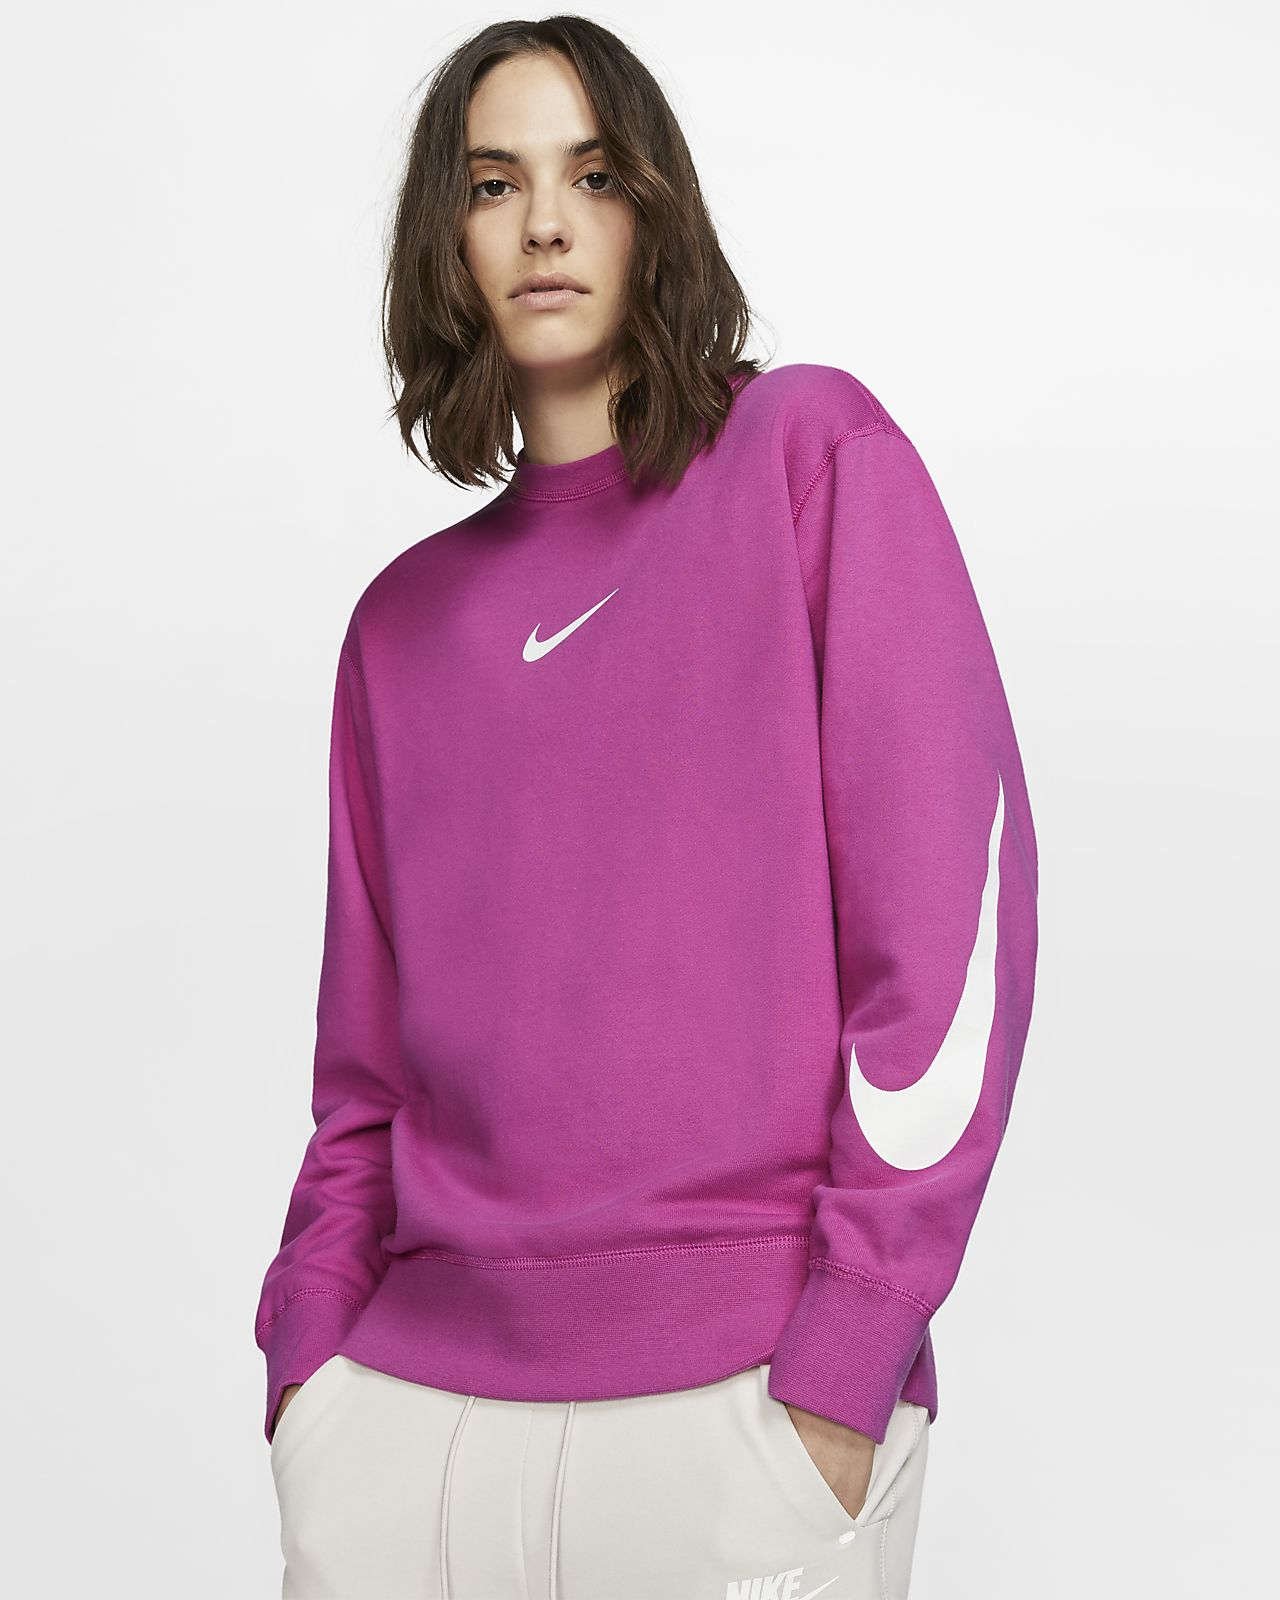 Nike Sportswear Swoosh Dessuadora de màniga llarga de teixit French Terry